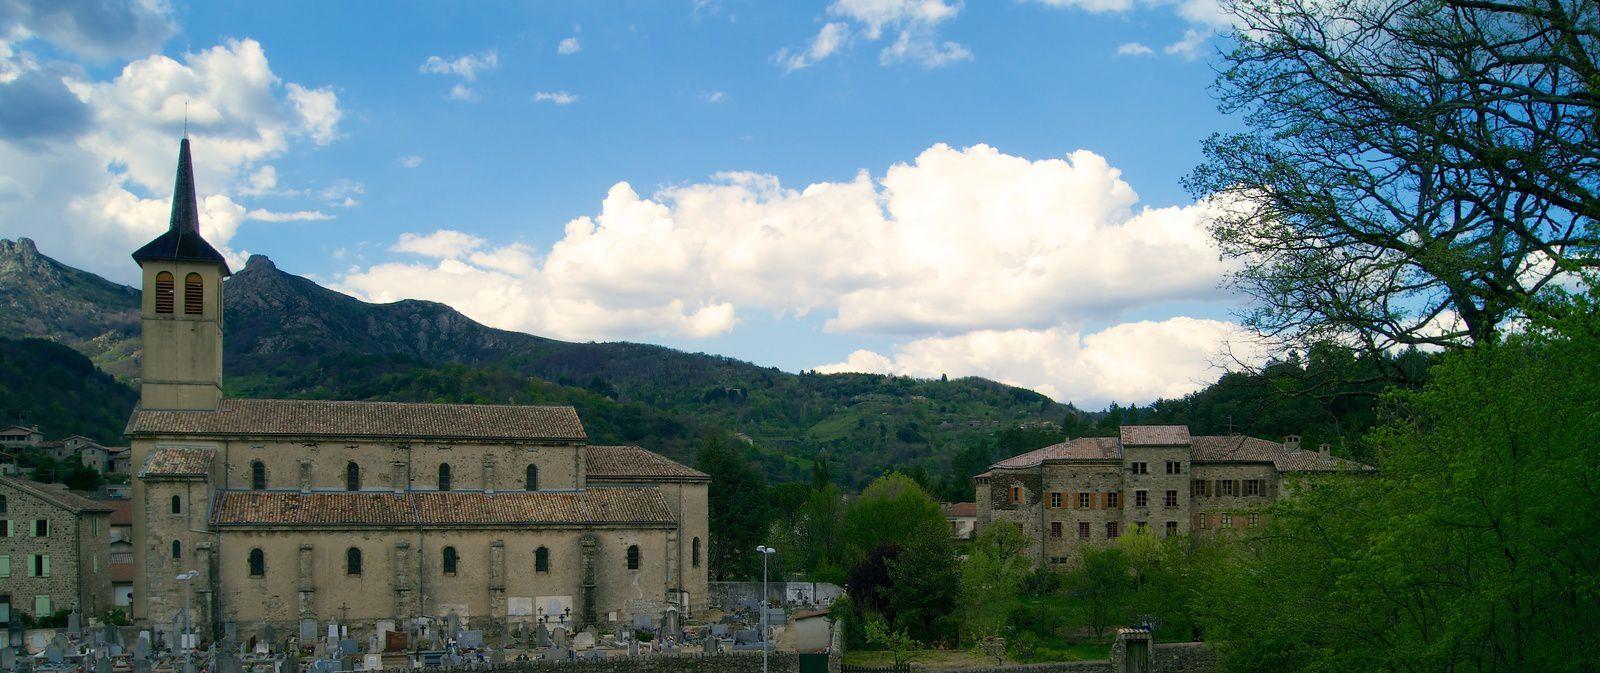 Le village de Jaujac